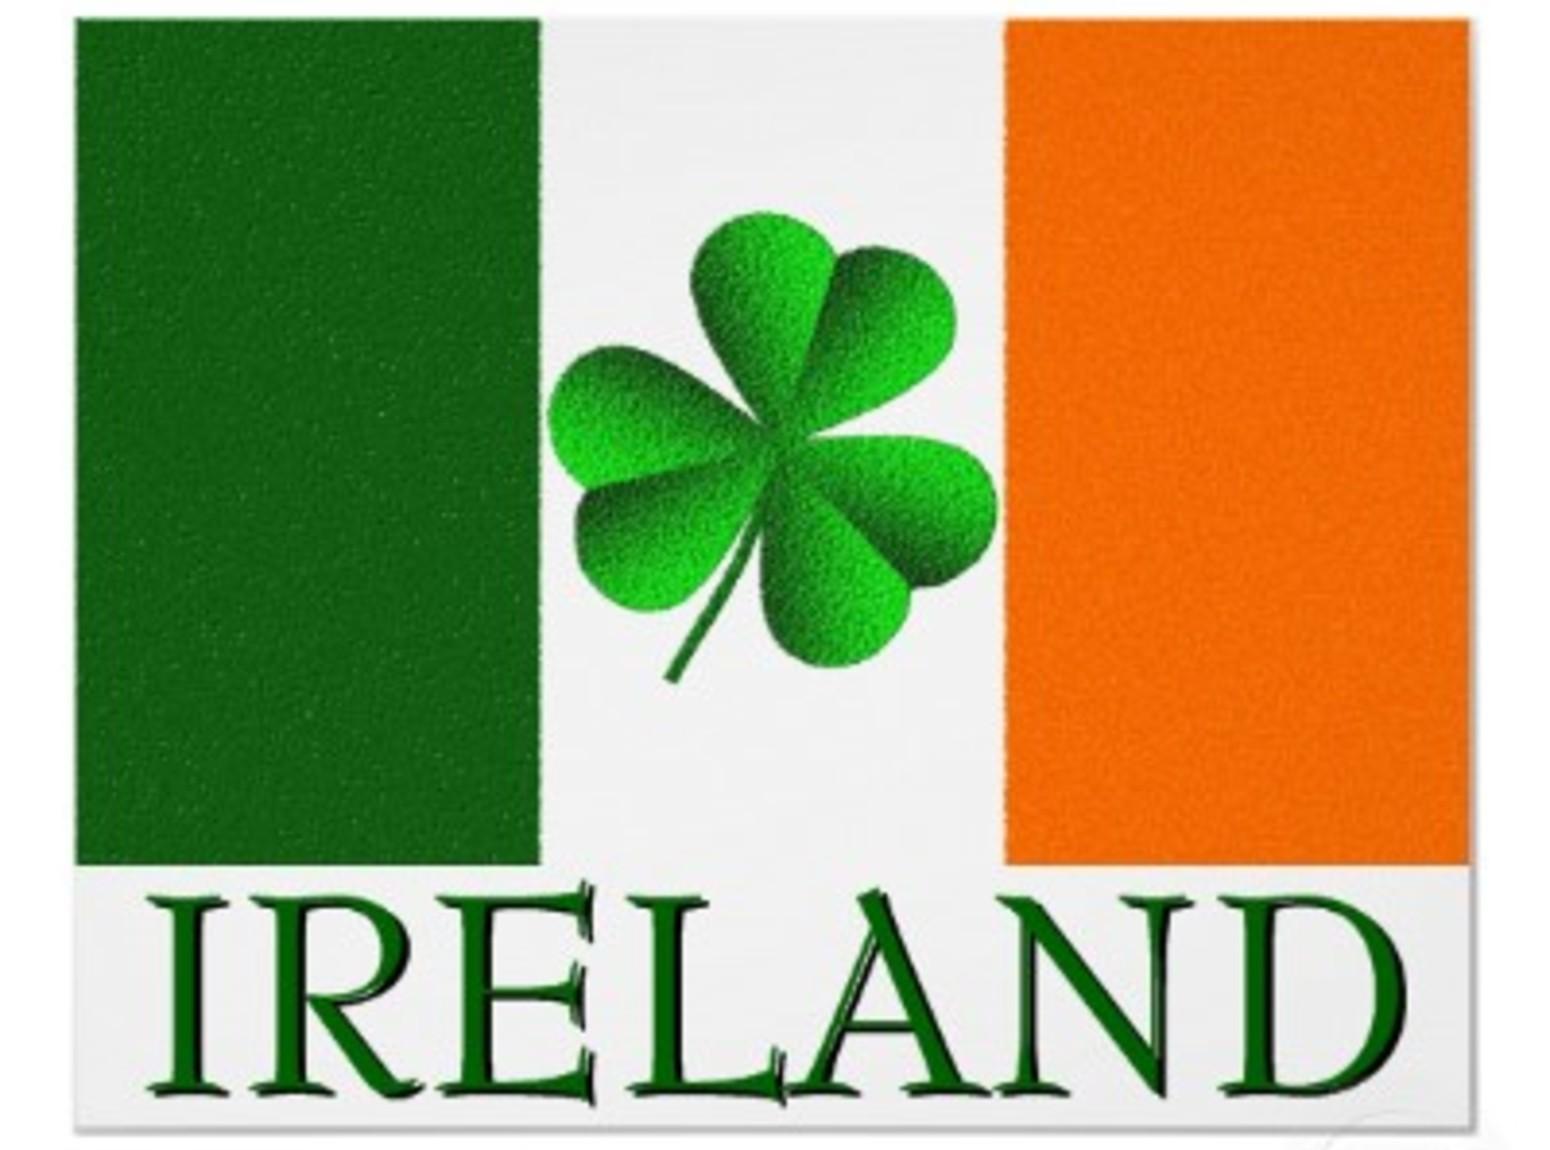 50+] Mickey St Patrick's Day Wallpaper on WallpaperSafari